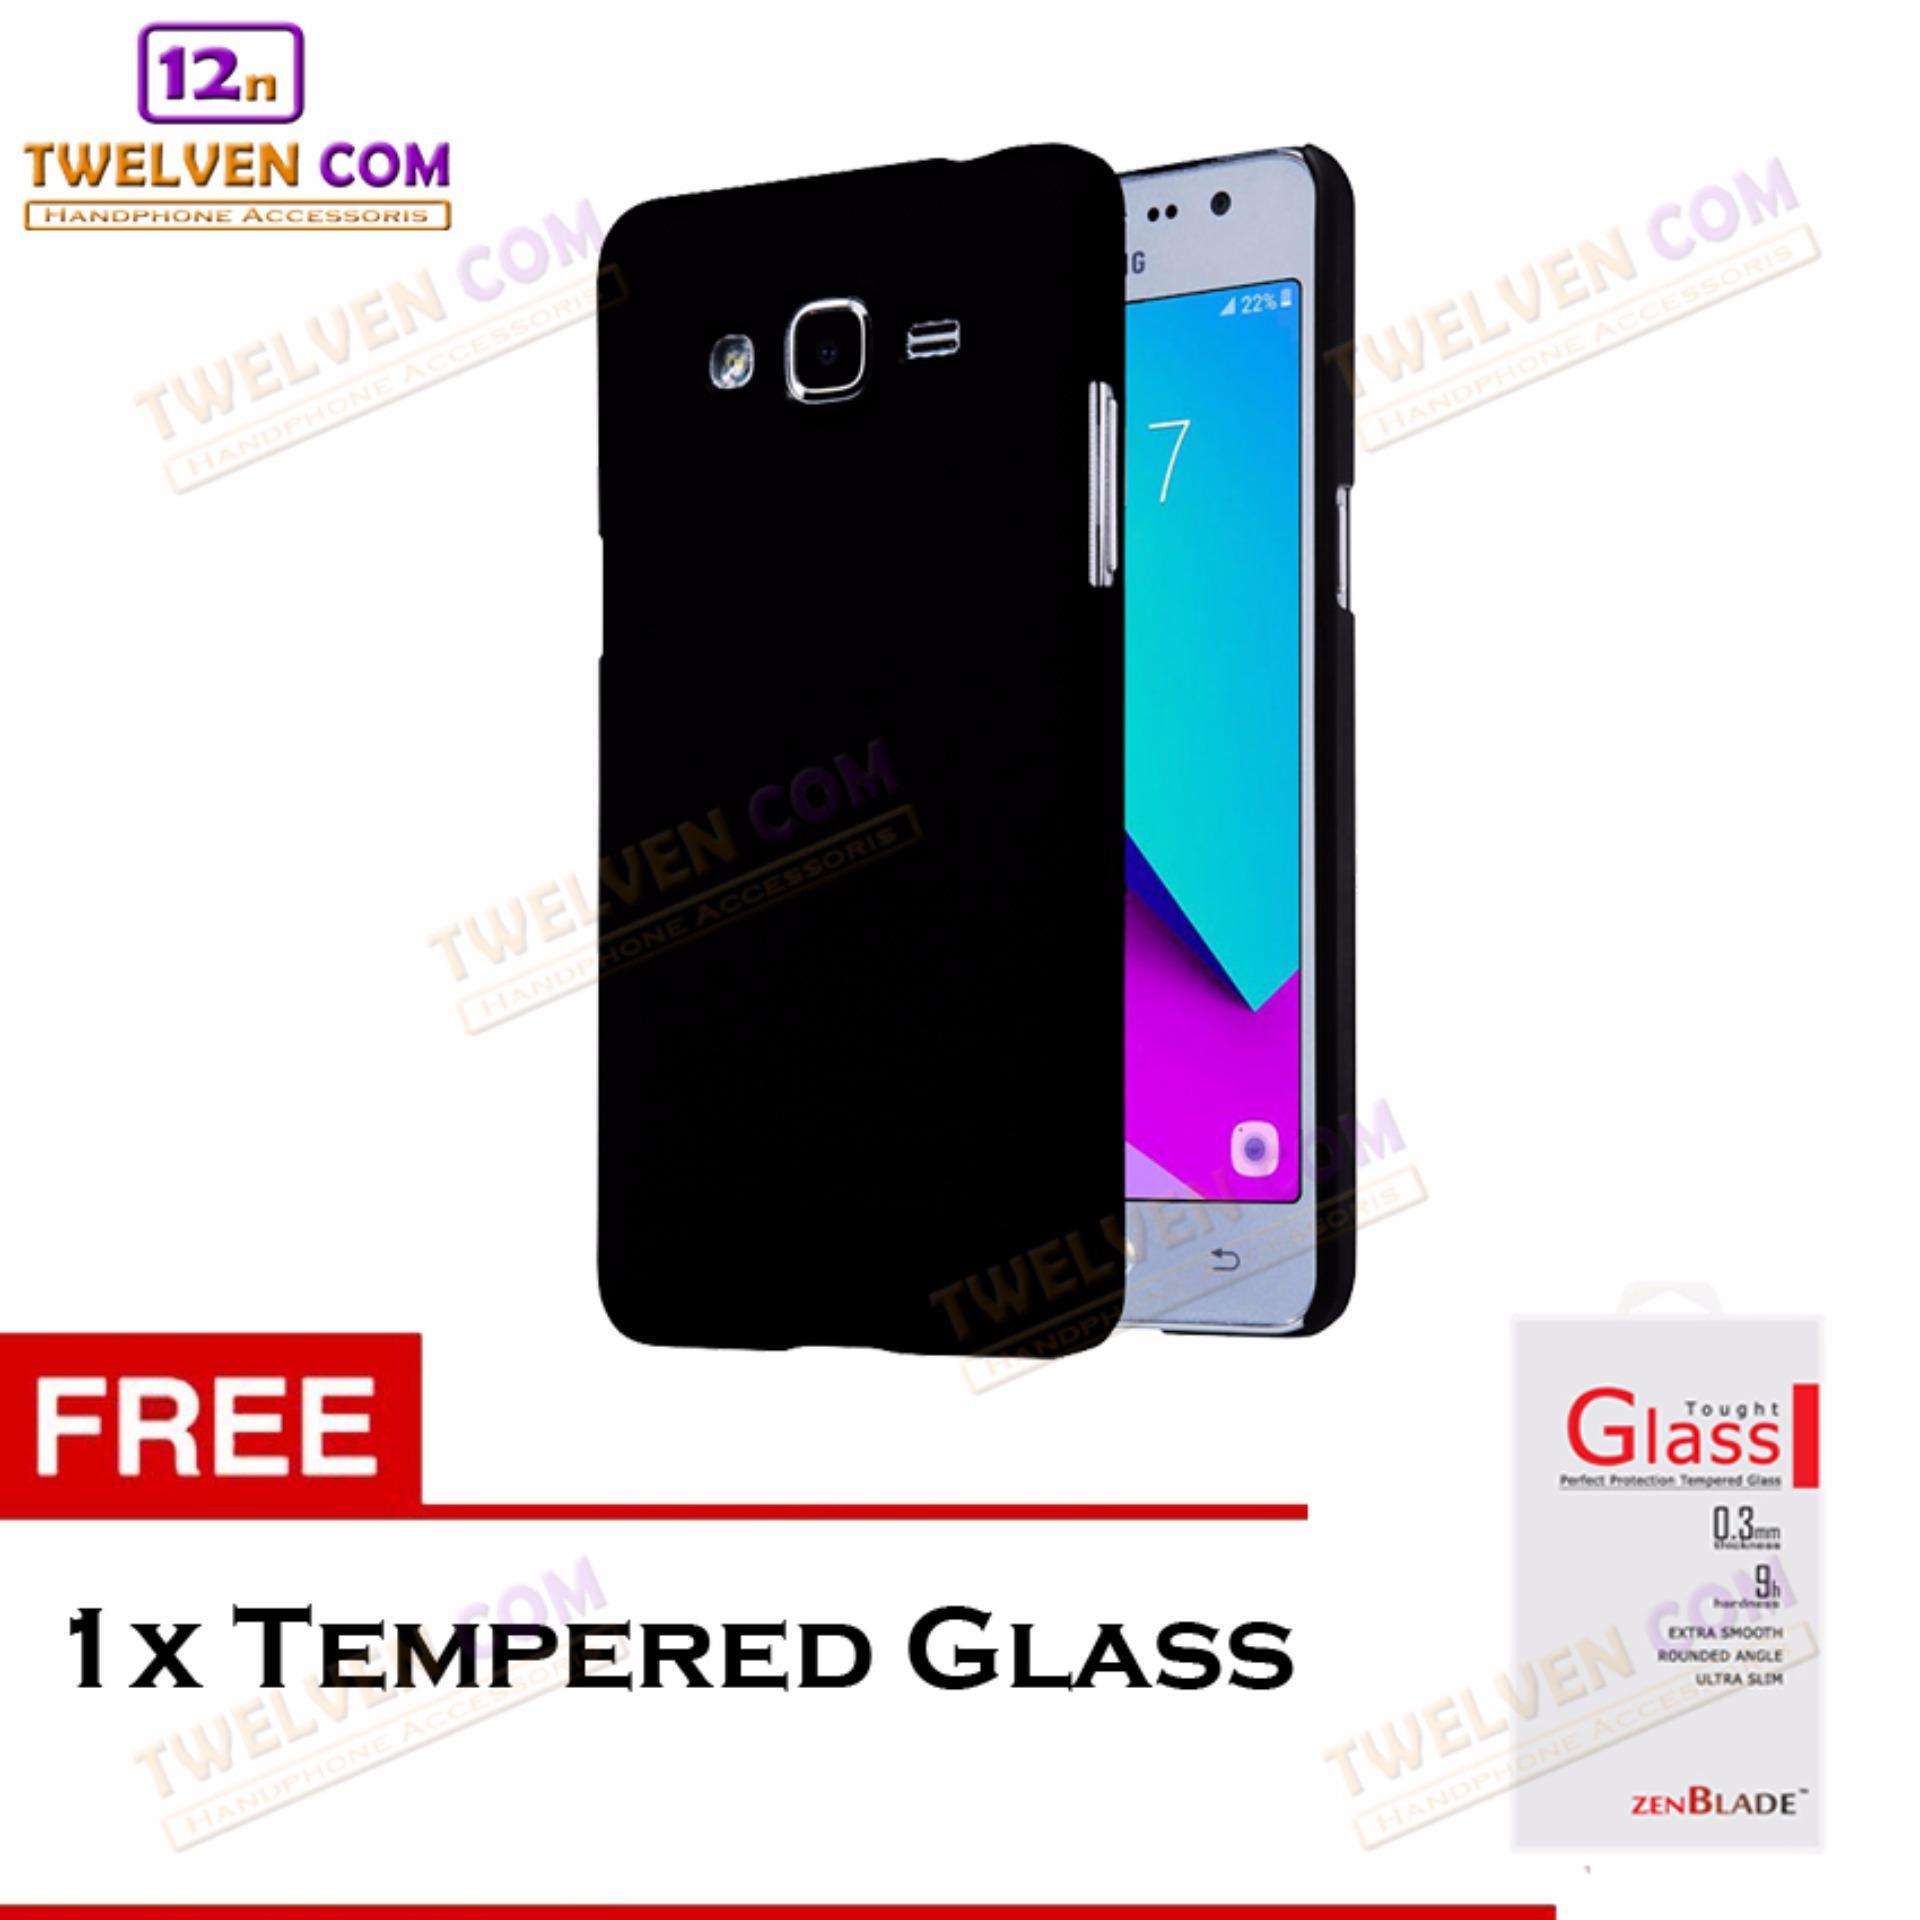 Twelven Case Slim Matte For Samsung J2 Prime / Grand Prime G530 - Free Tempered Glass